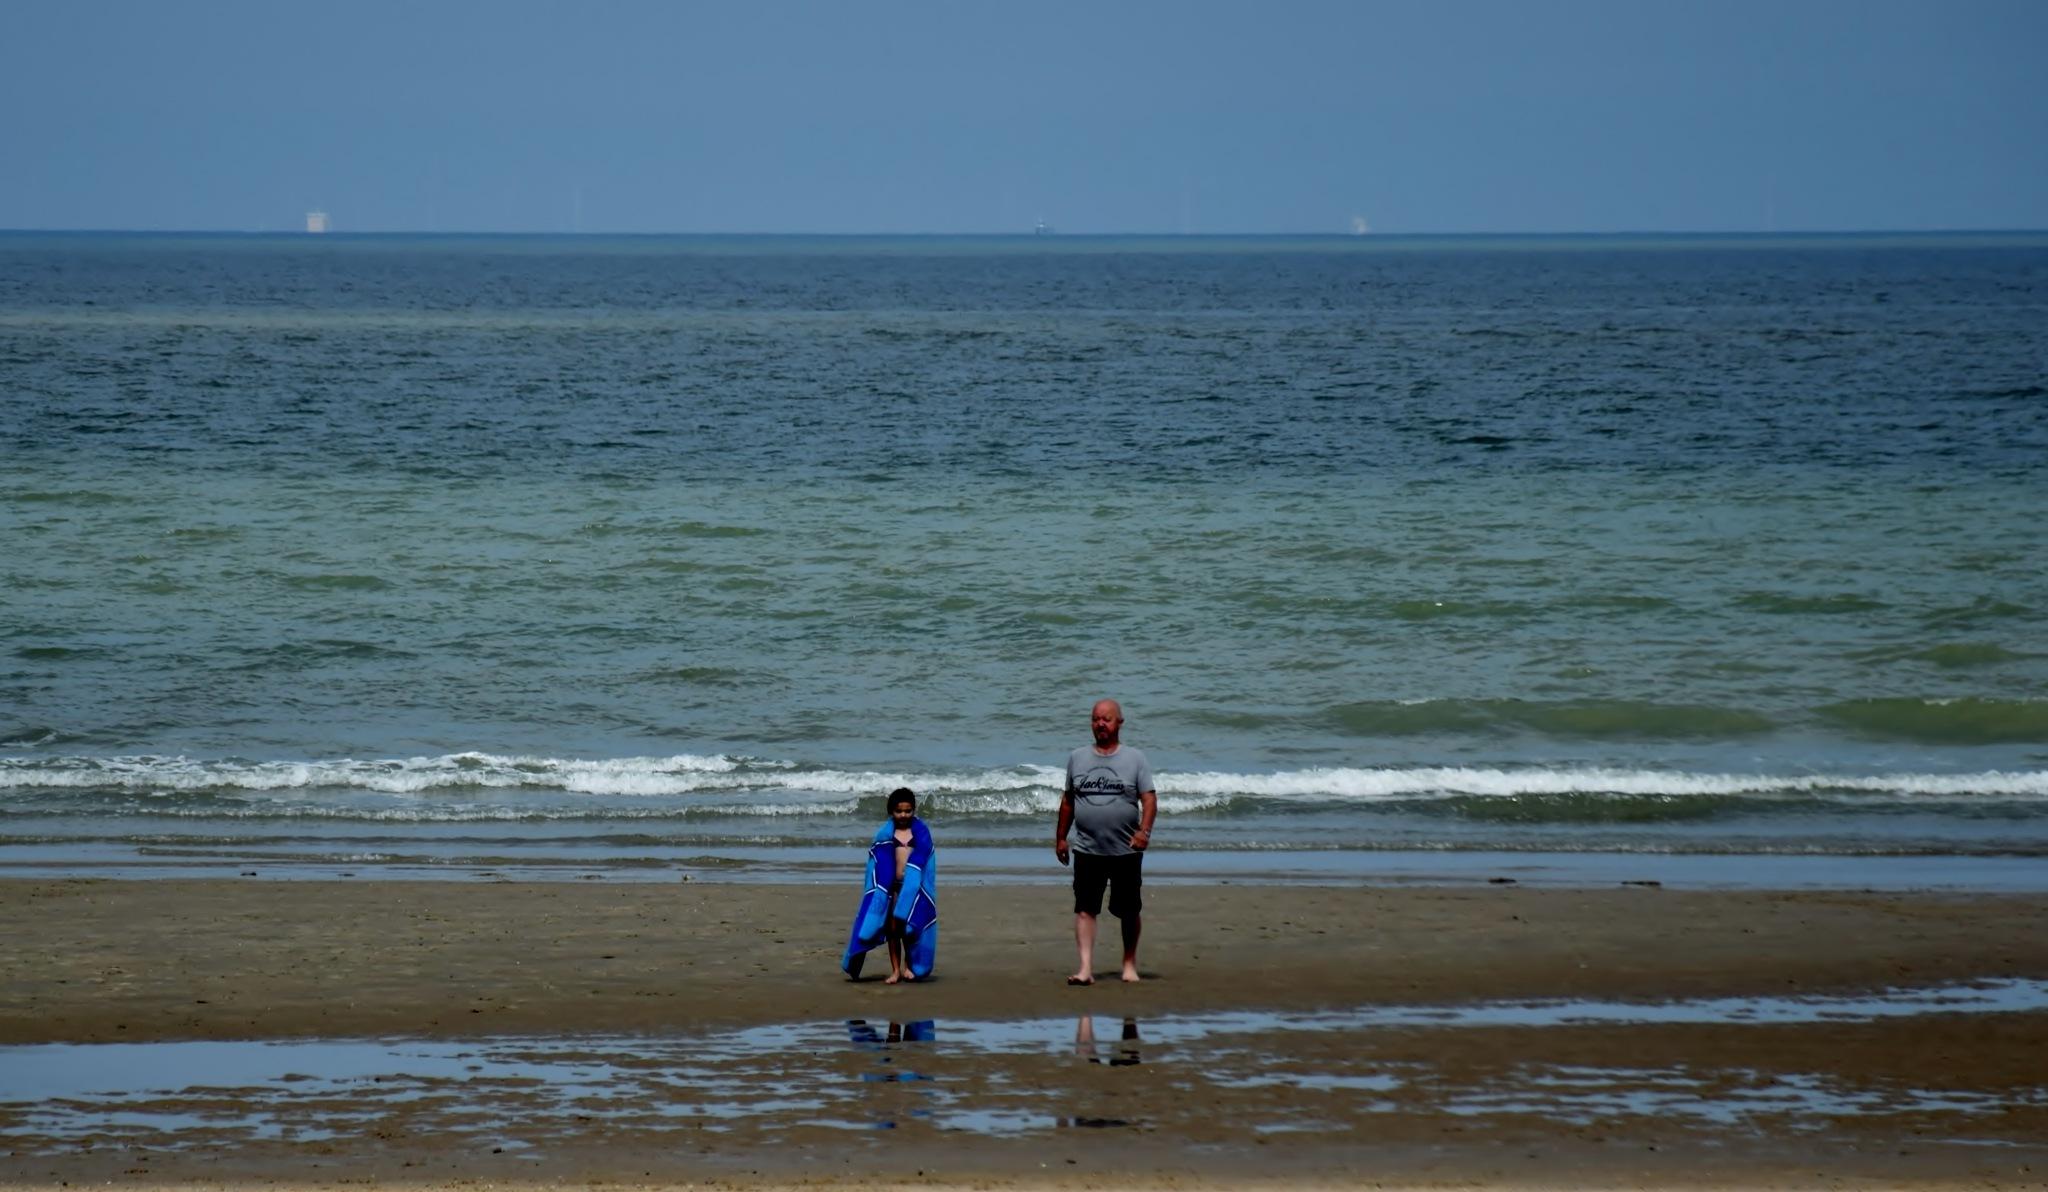 Swimming at the sea #summercontest2017 by Diane Van Daele